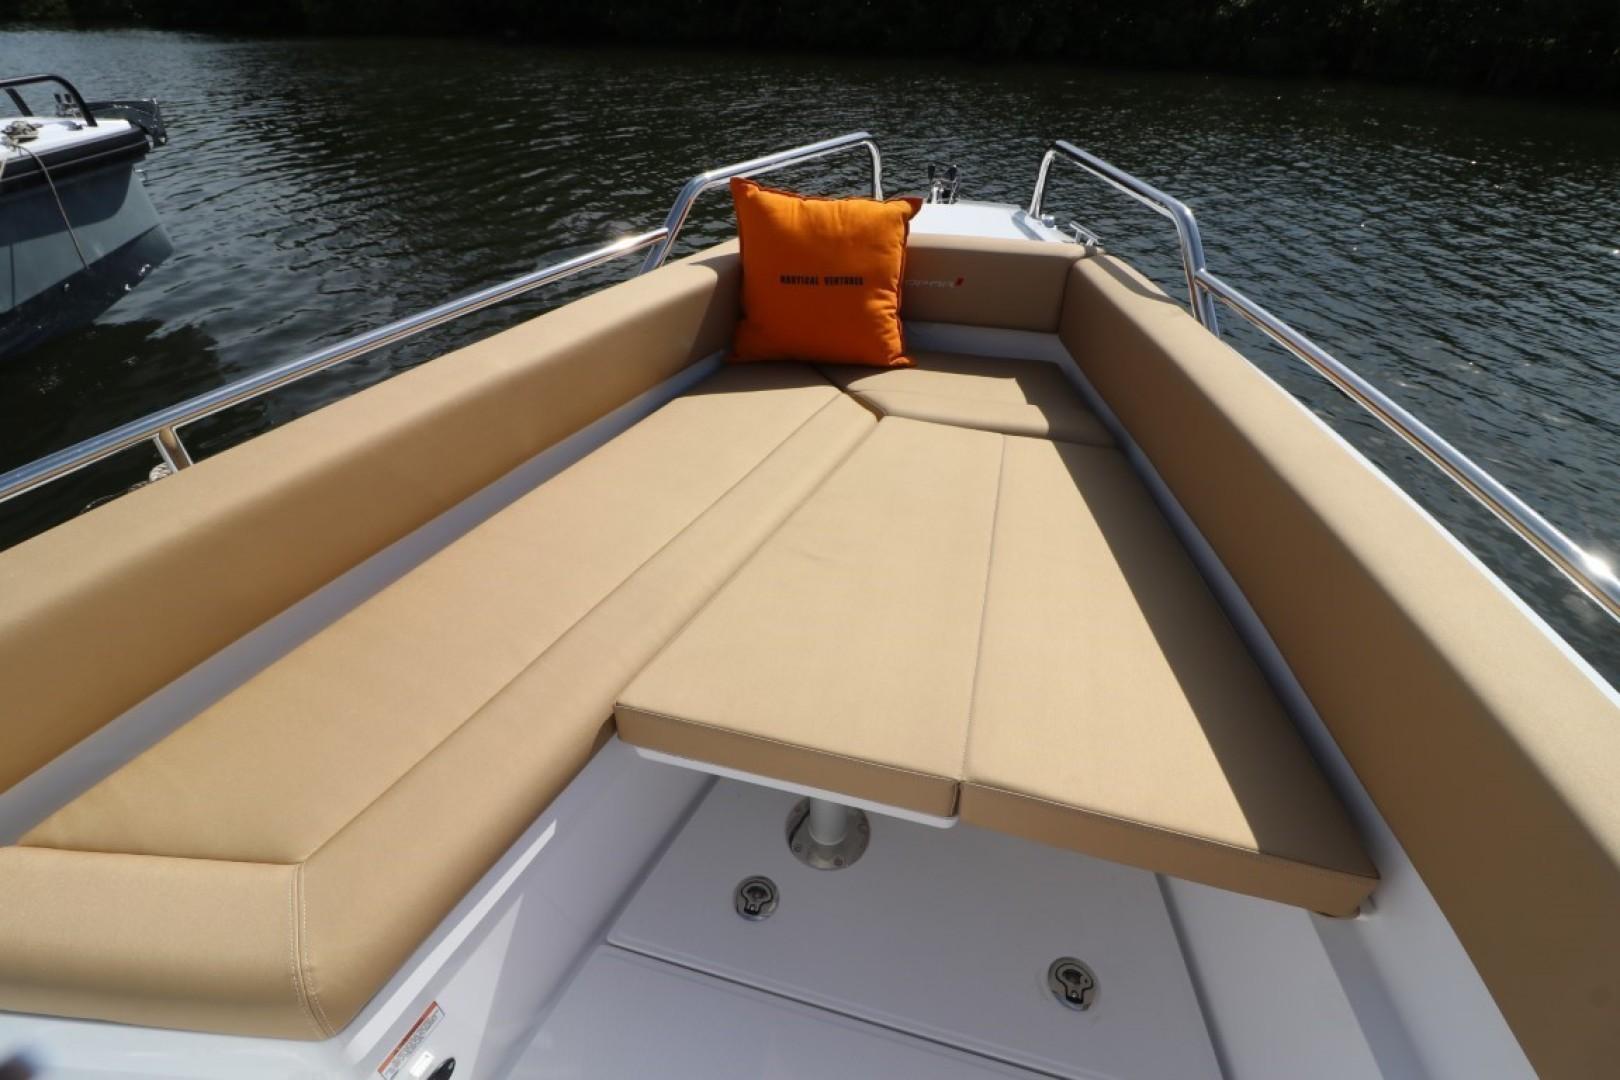 Axopar-28 CABIN 2020-Axopar 28 CABIN Fort Lauderdale-Florida-United States-1586685 | Thumbnail